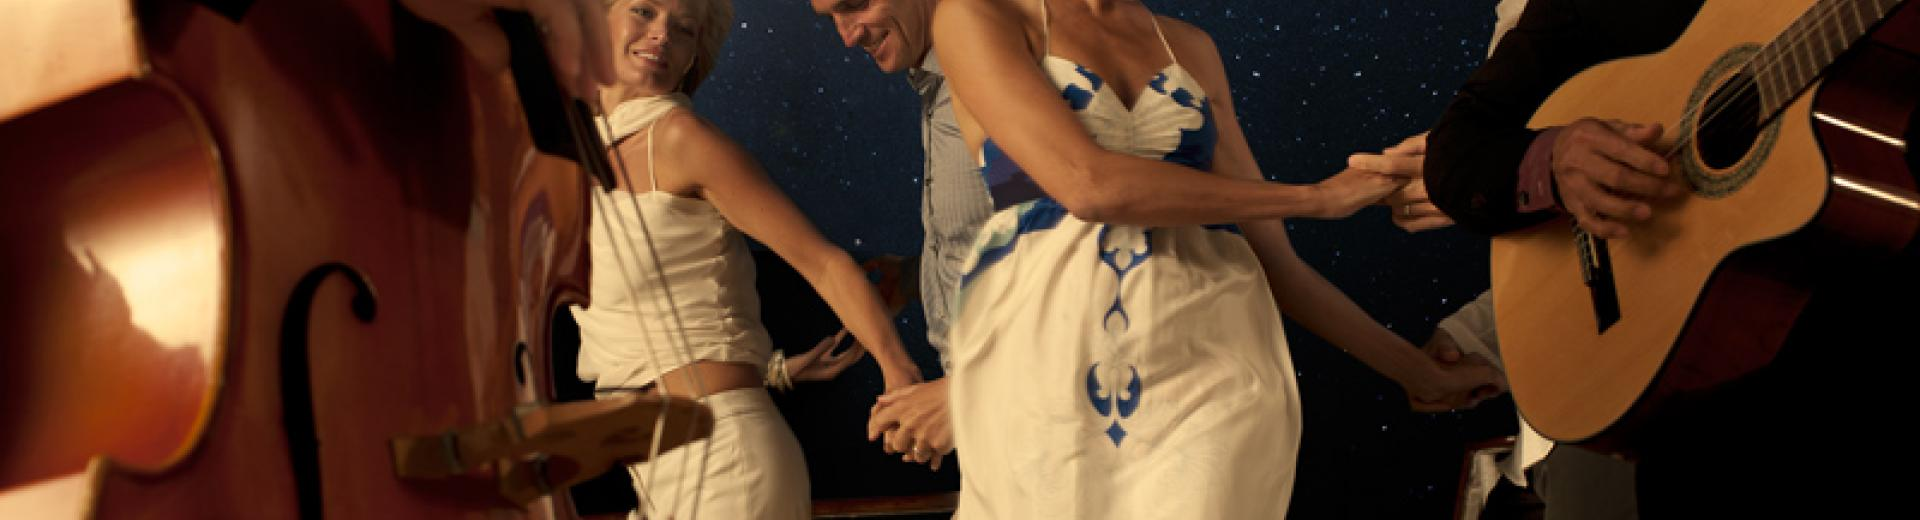 Seabourn Dancing